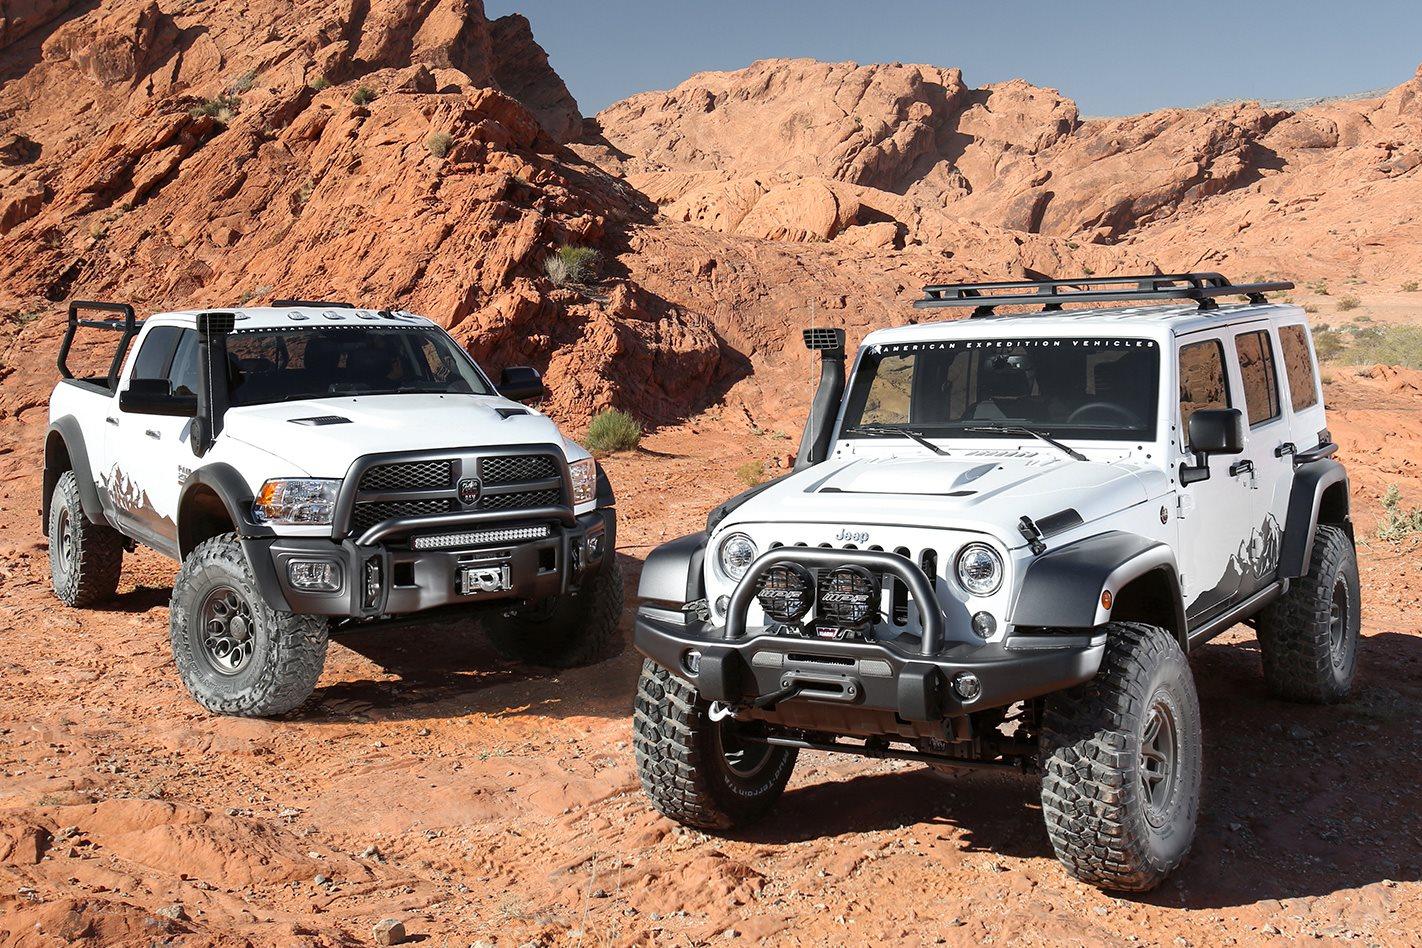 Aev Jeep For Sale >> Aev Jeep Custom Jeep Wranglers For Sale 2019 10 19